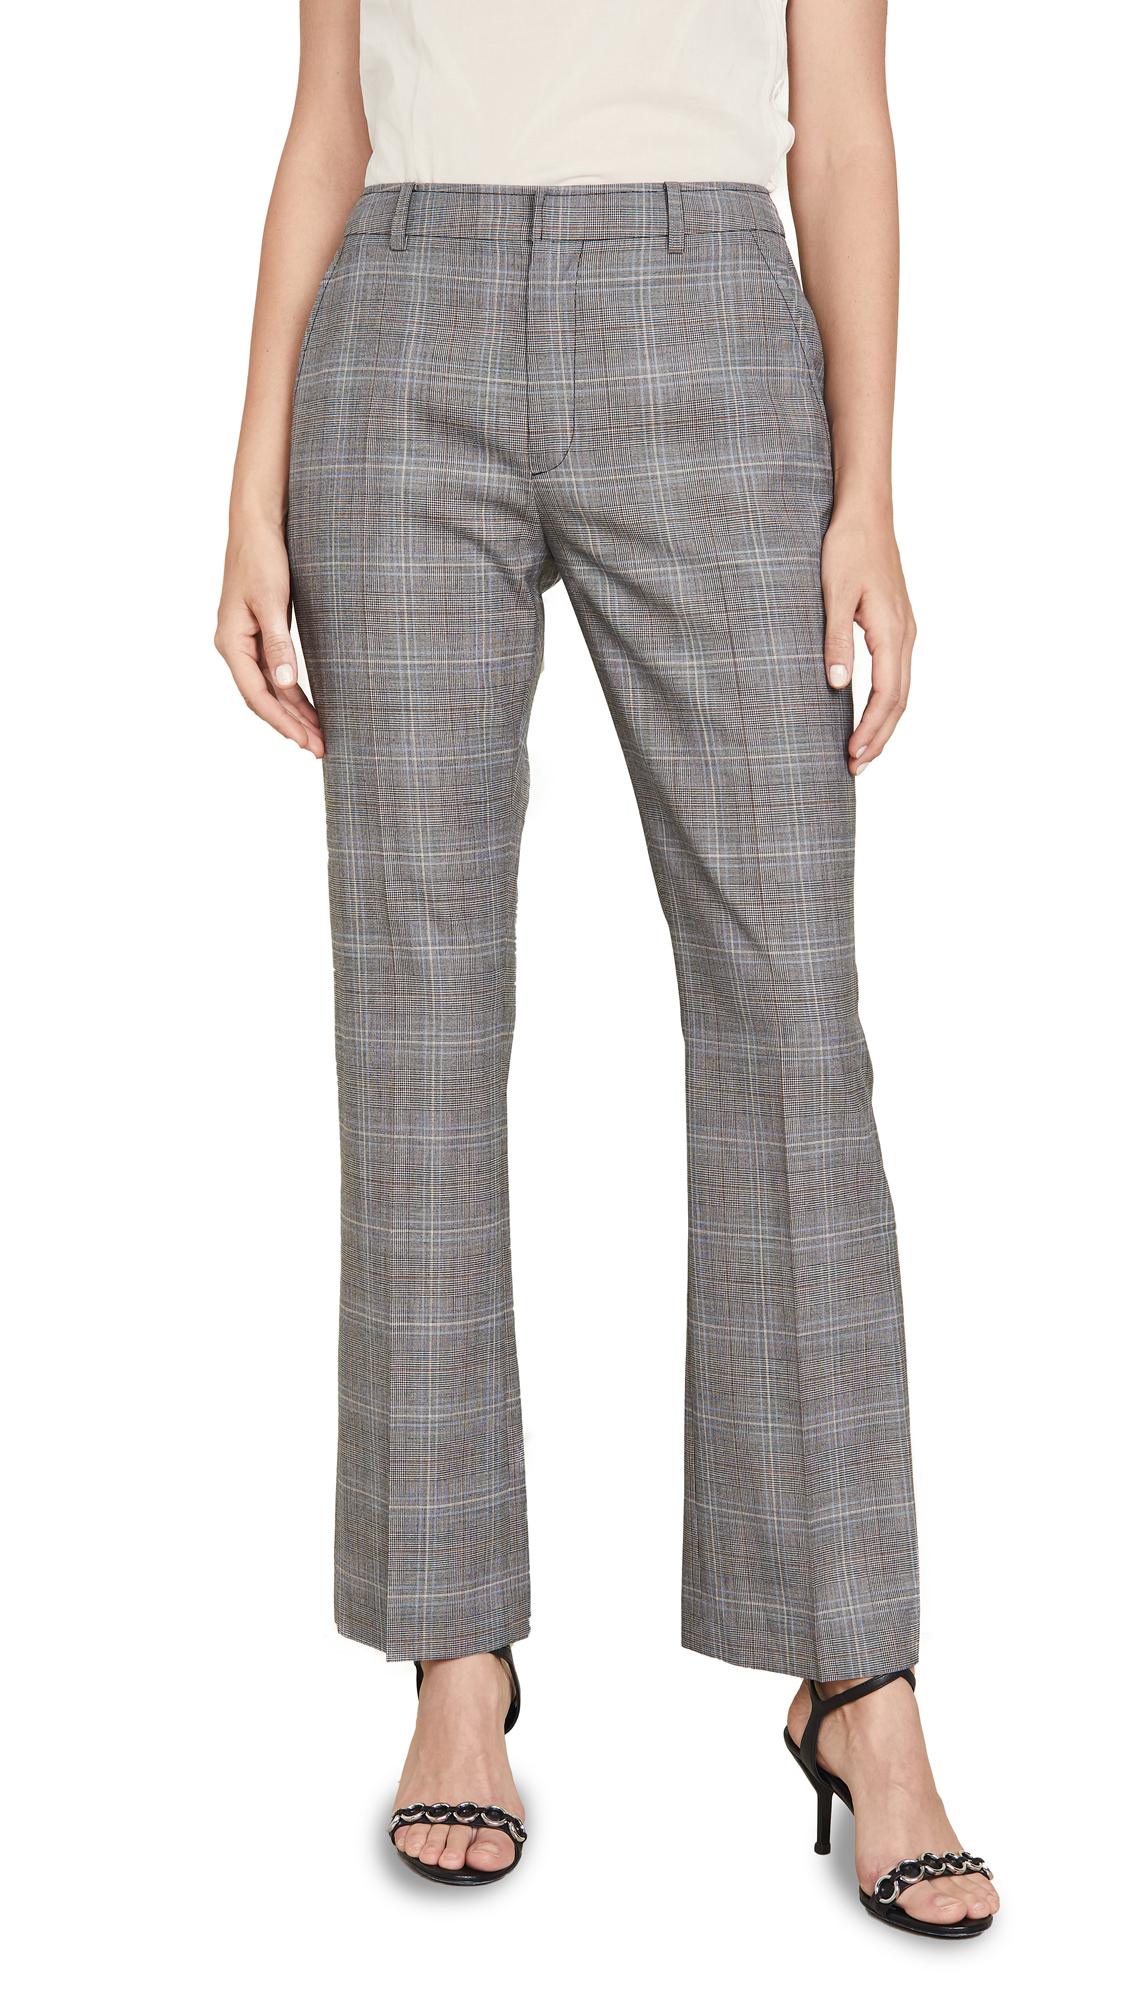 Adeam Tailored Cigarette Pants - Slate